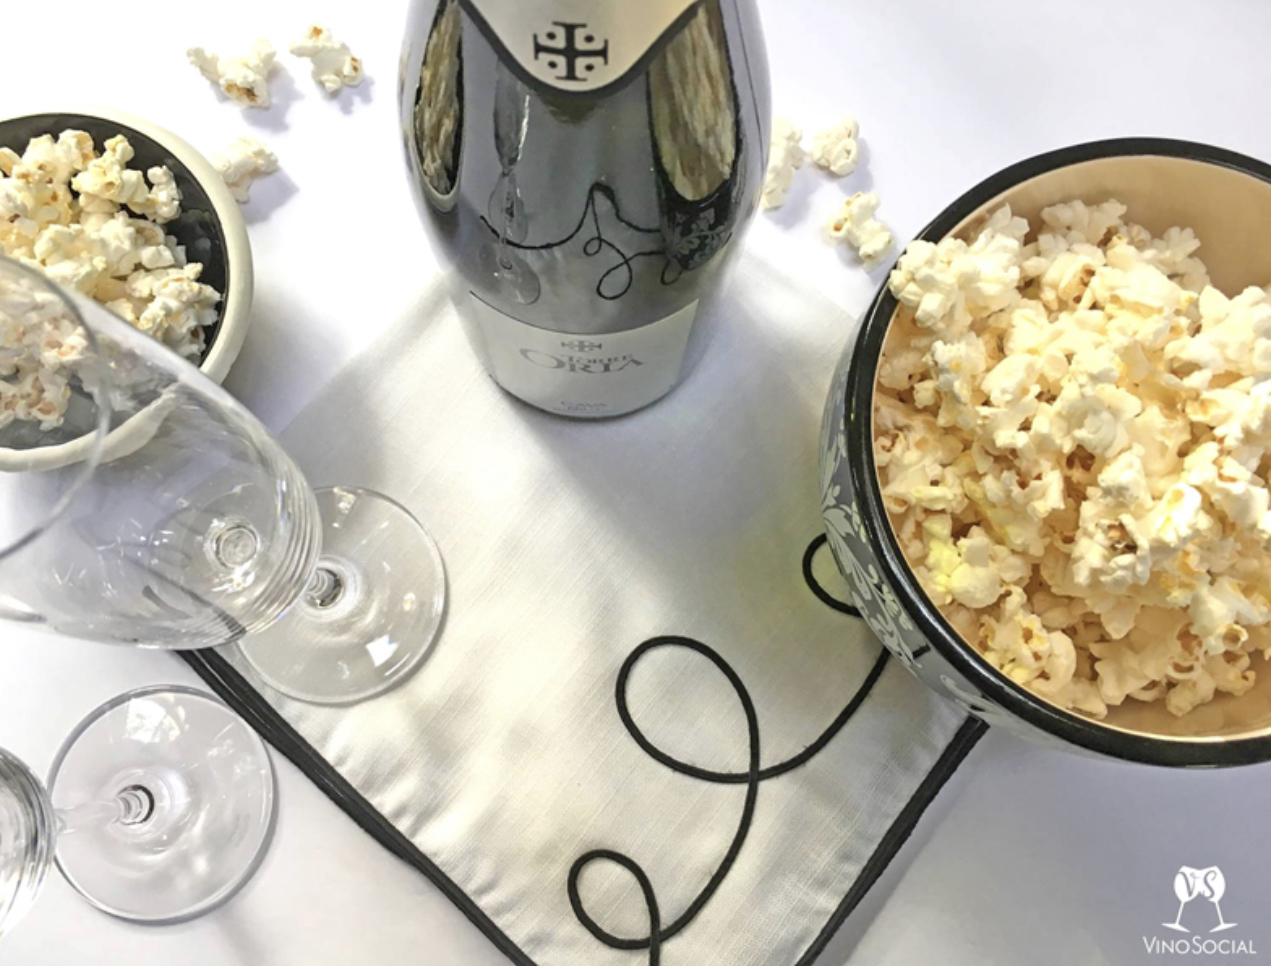 Sparkling wine and popcorn pairing